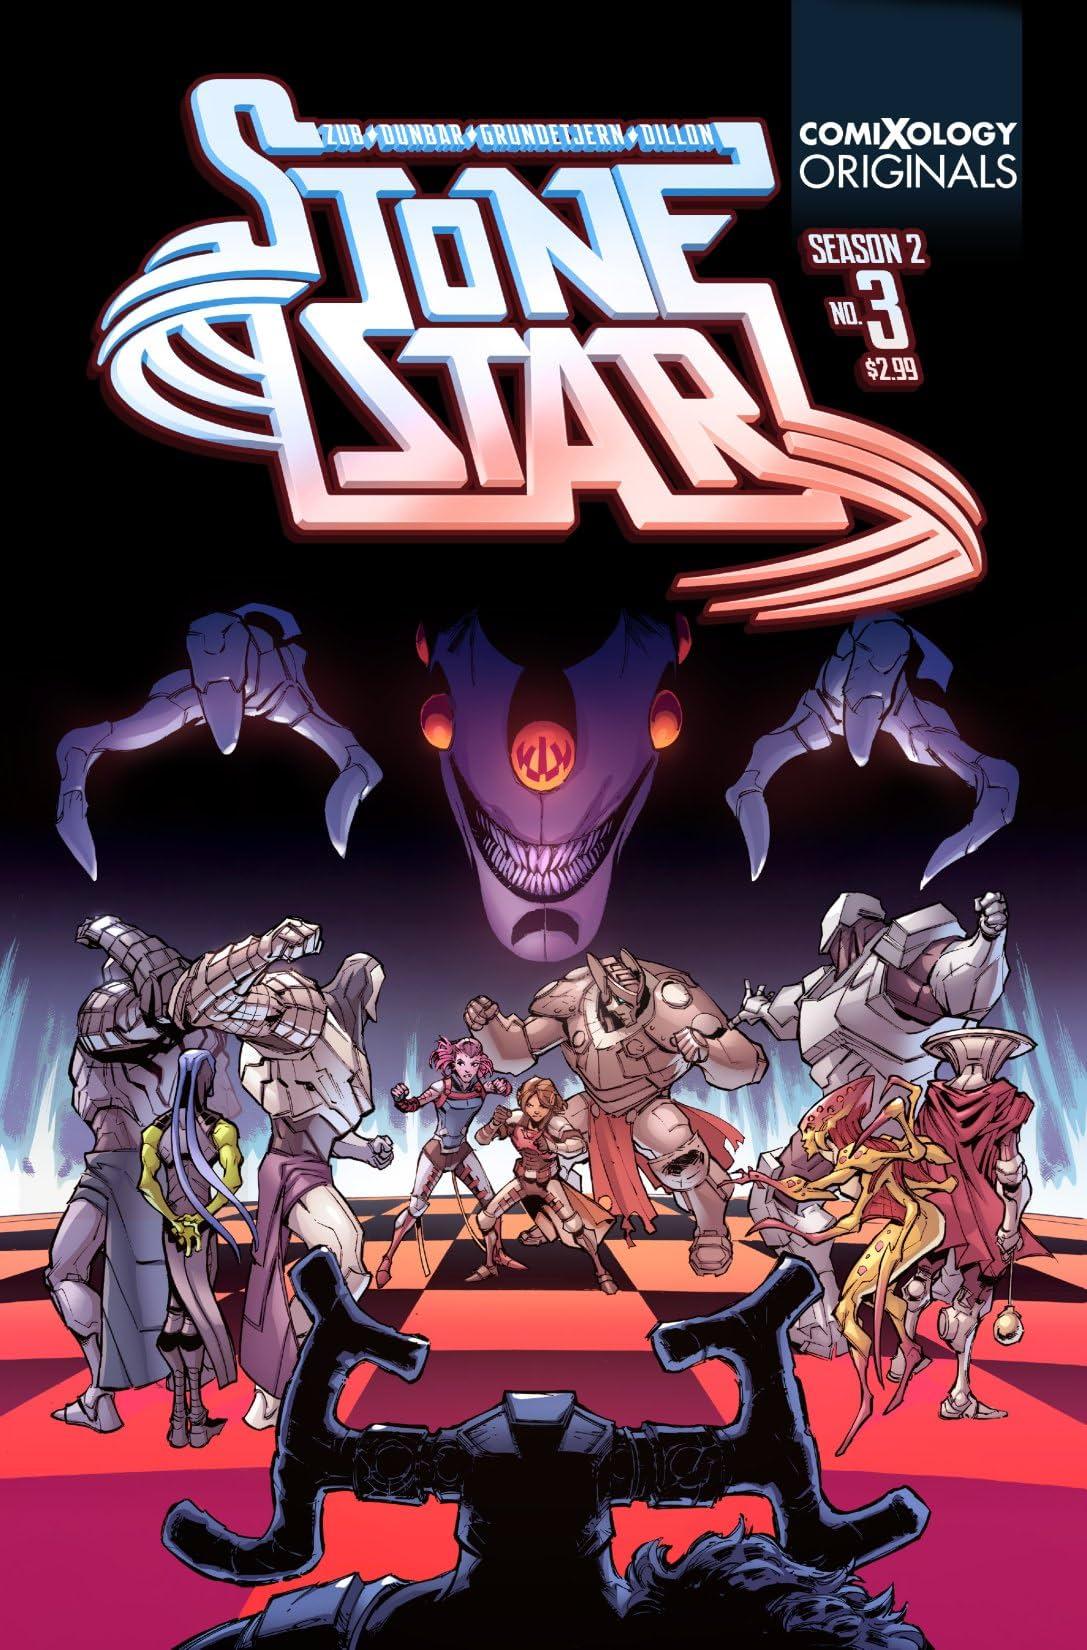 Stone Star Season Two (comiXology Originals) #3 (of 5)